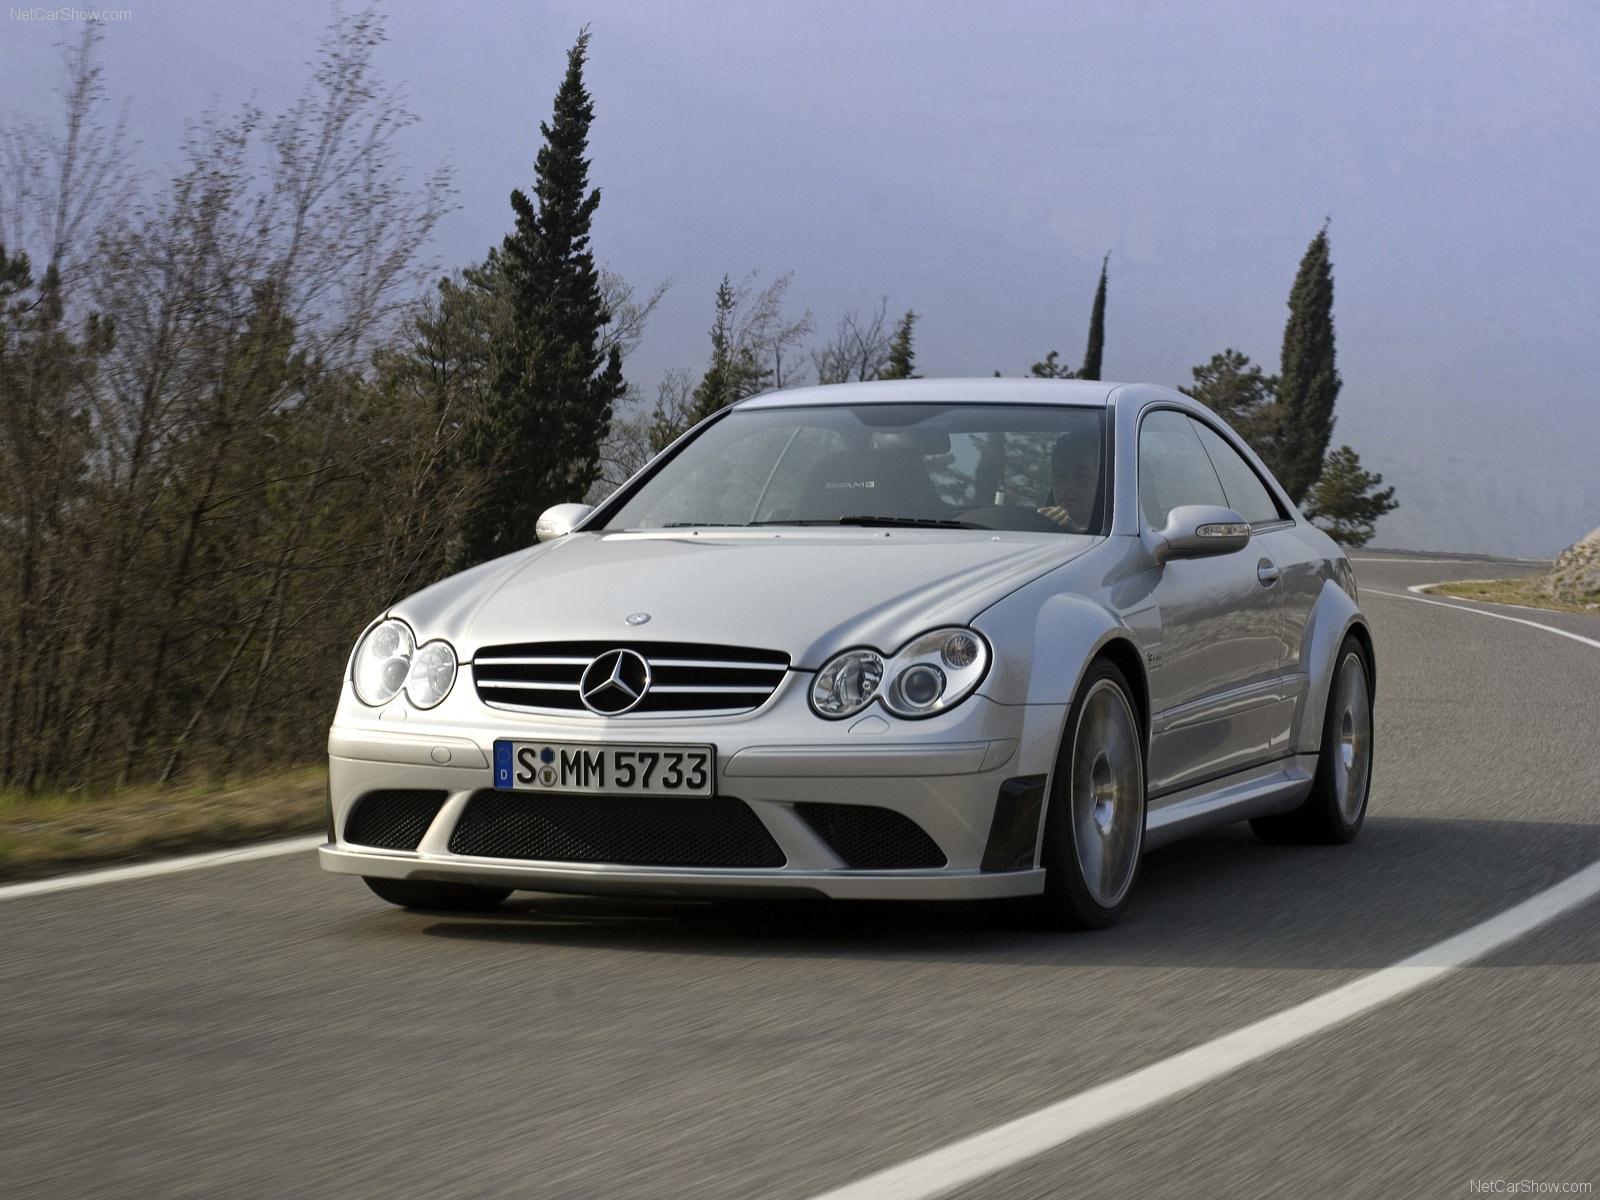 2008 Mercedes-Benz CLK63 AMG Black Series Pictures